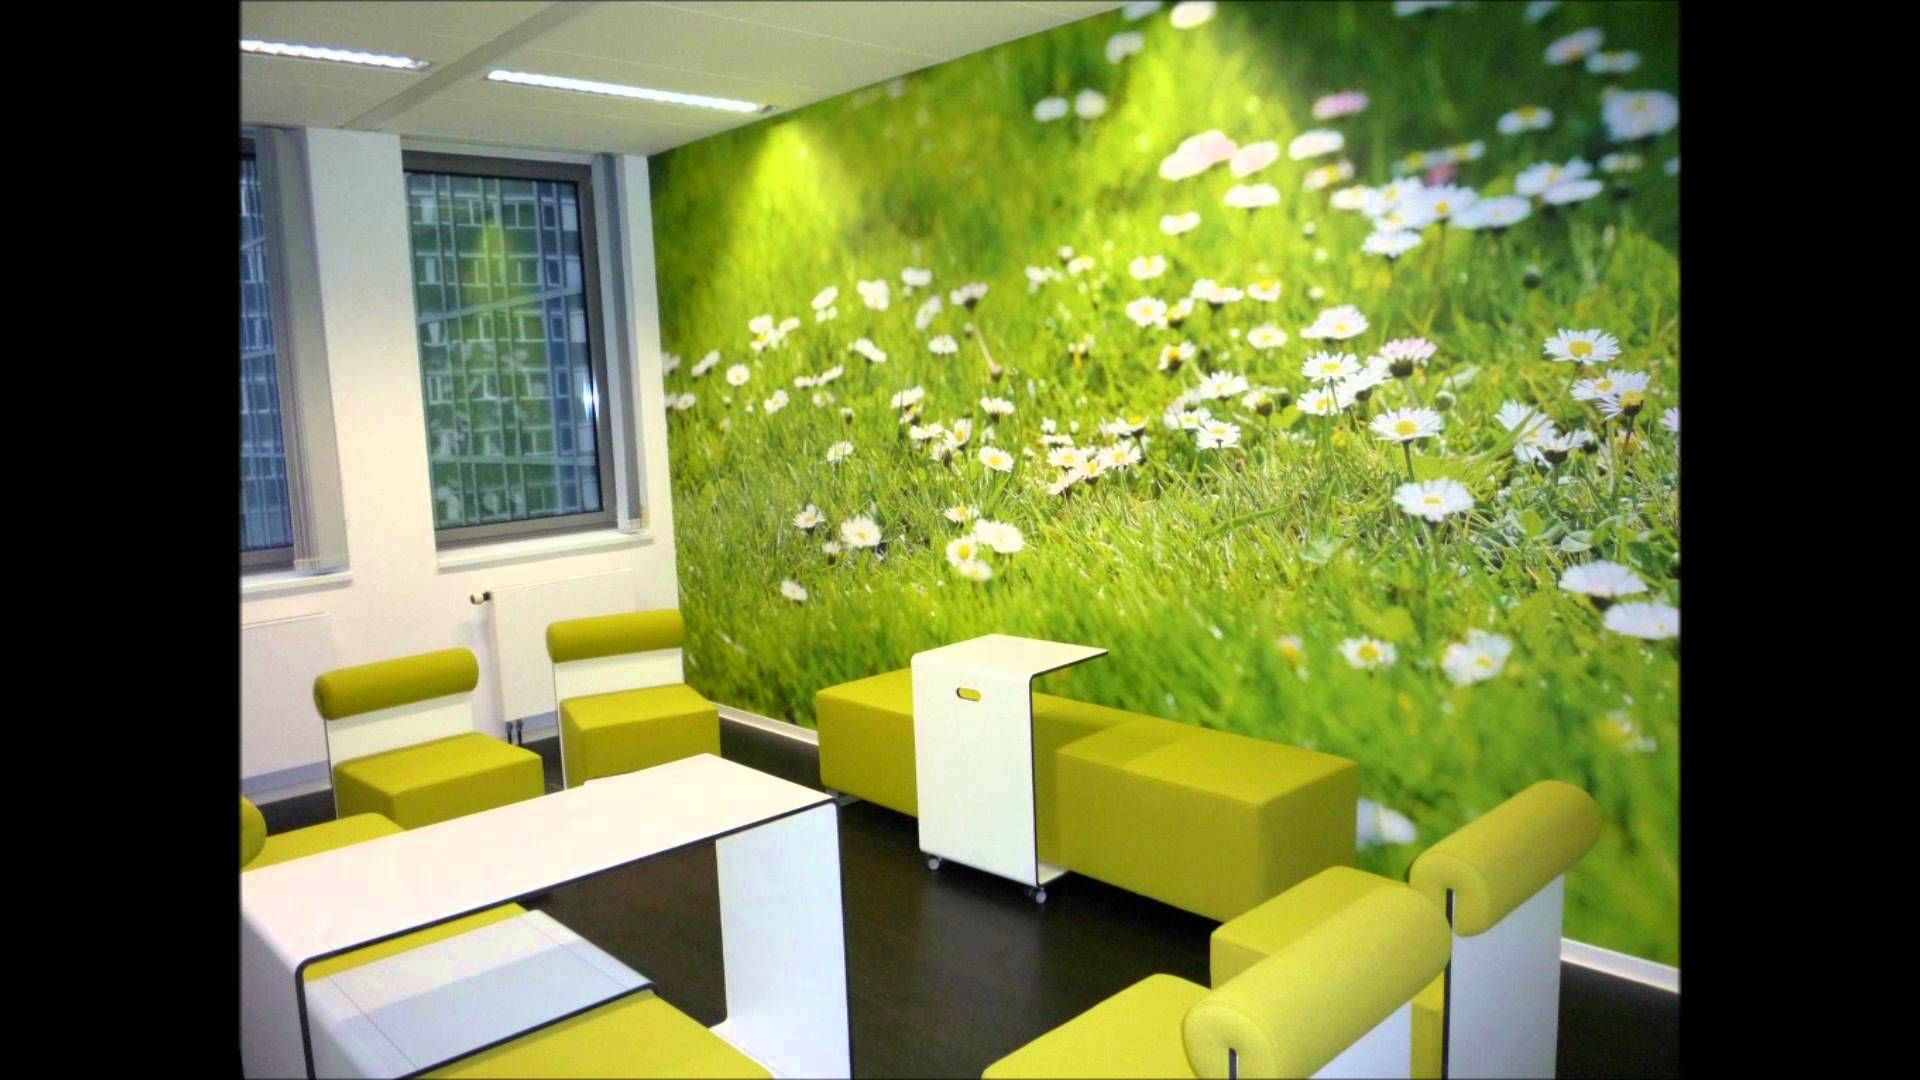 Pin De Kim Granda En Lobby Inspiration Pinterest ~ Pintura Decorativa Paredes Interiores